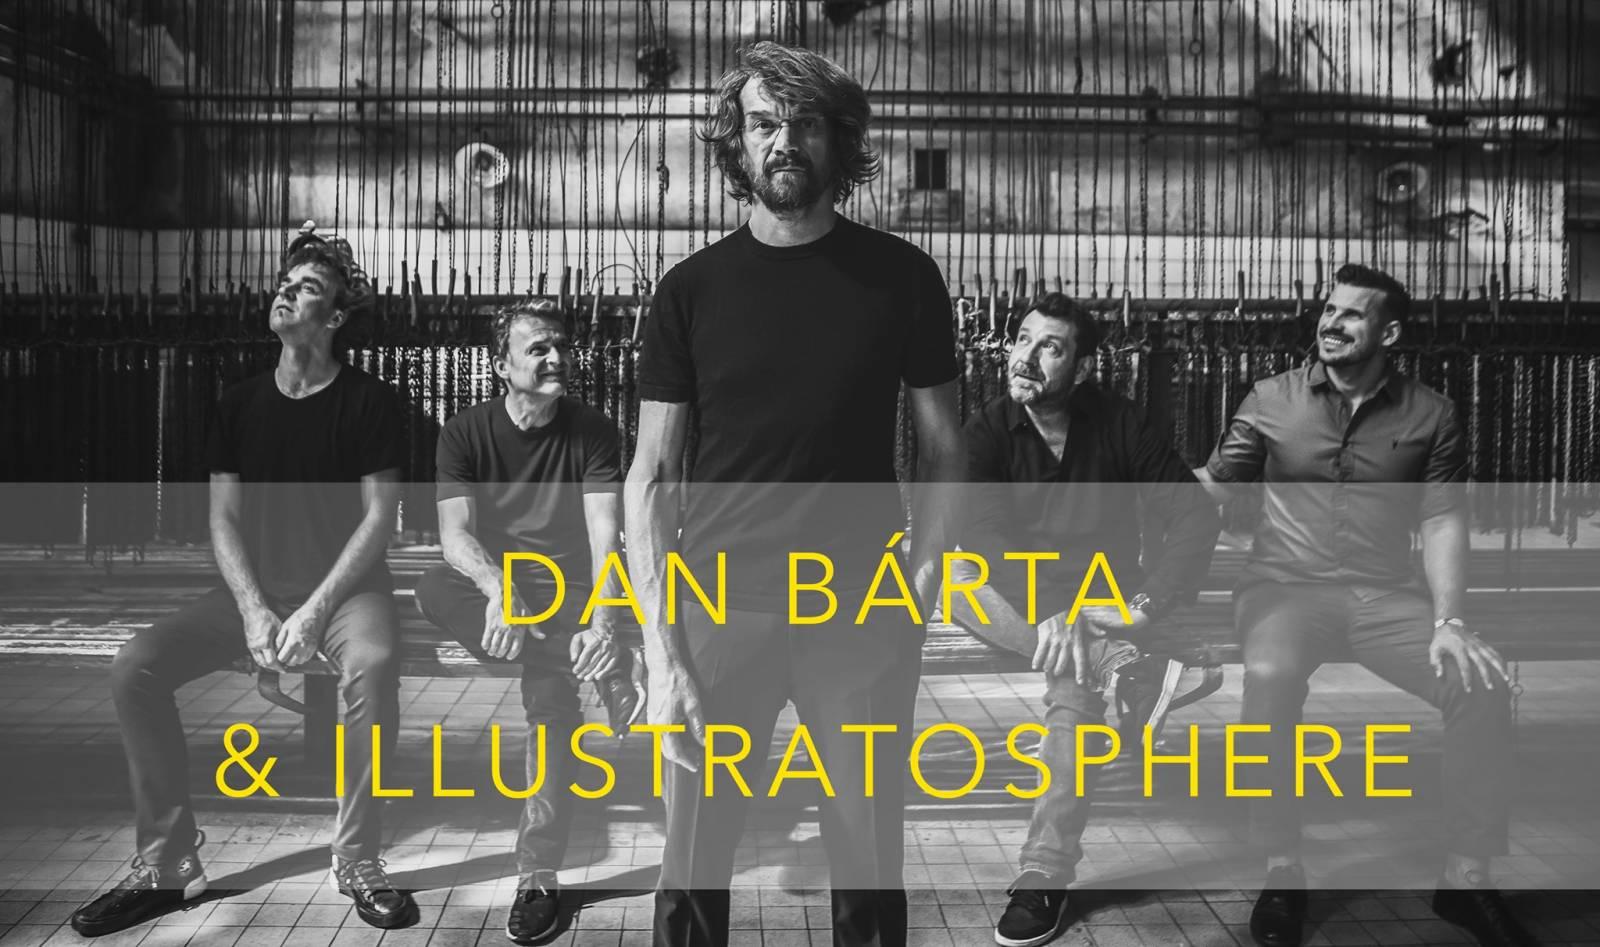 Zvířený prach tour: Dan Bárta & Illustratosphere